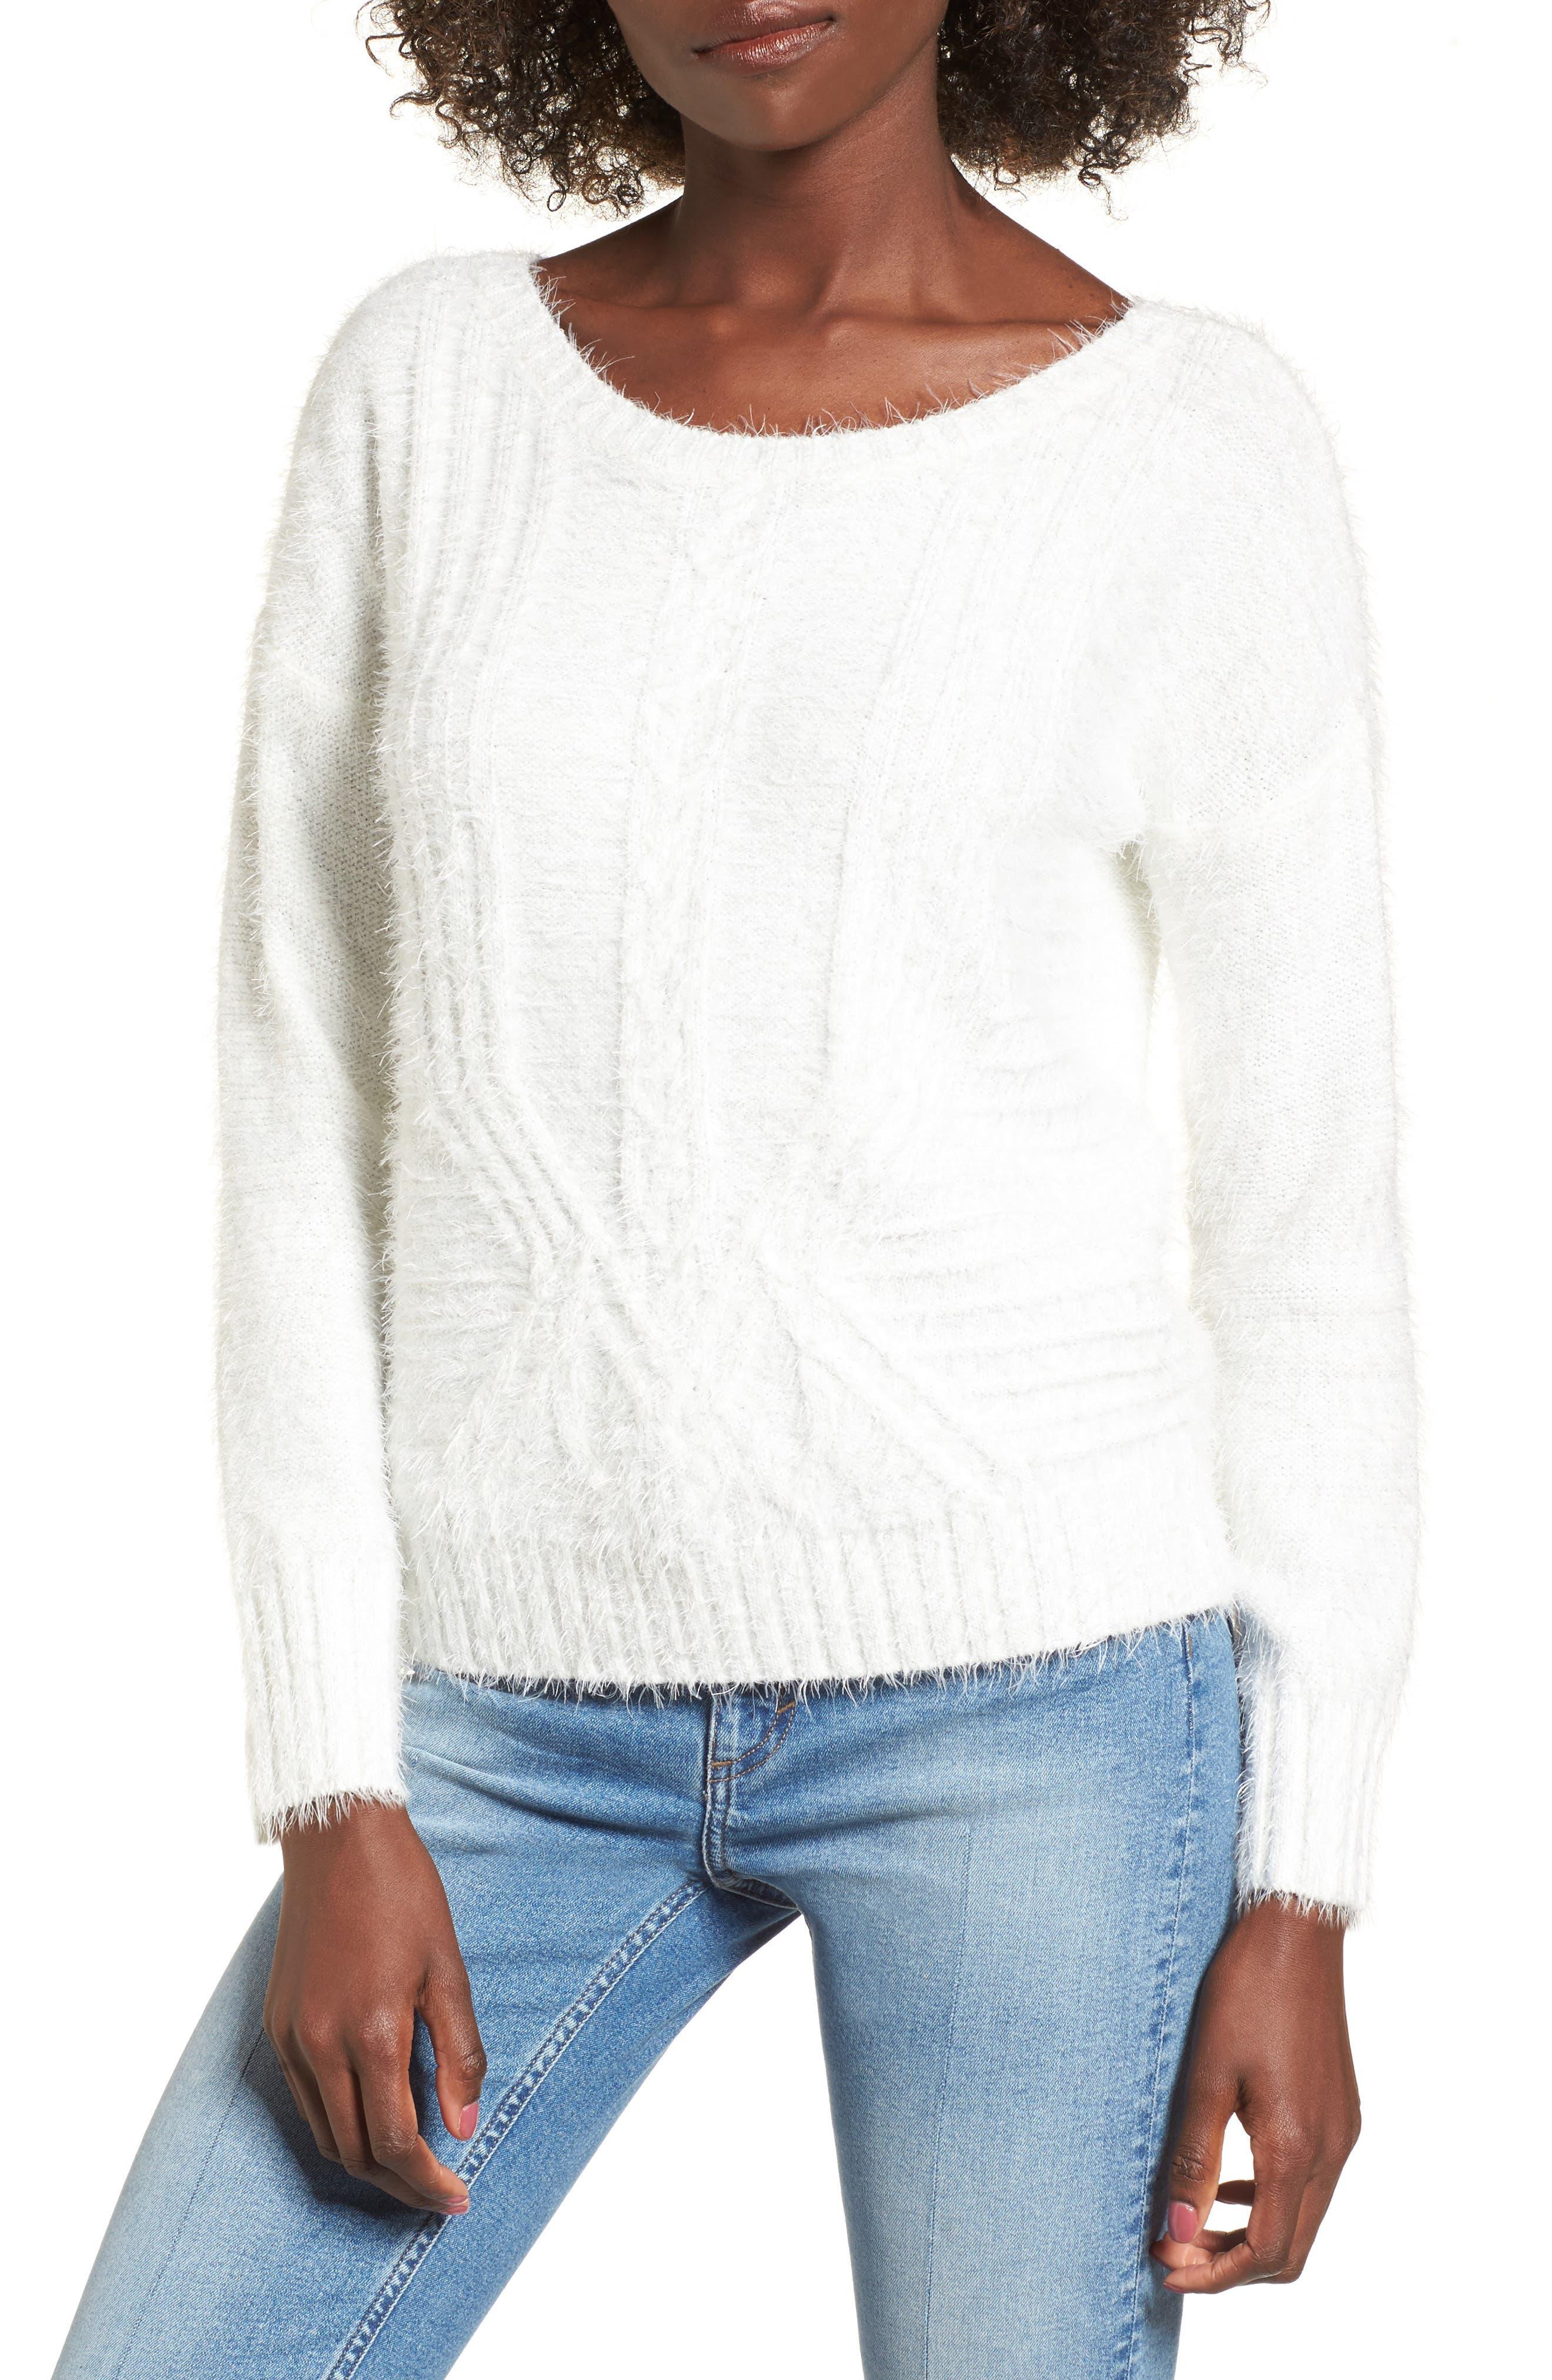 Main Image - Raga Emily Eyelash Knit Sweater